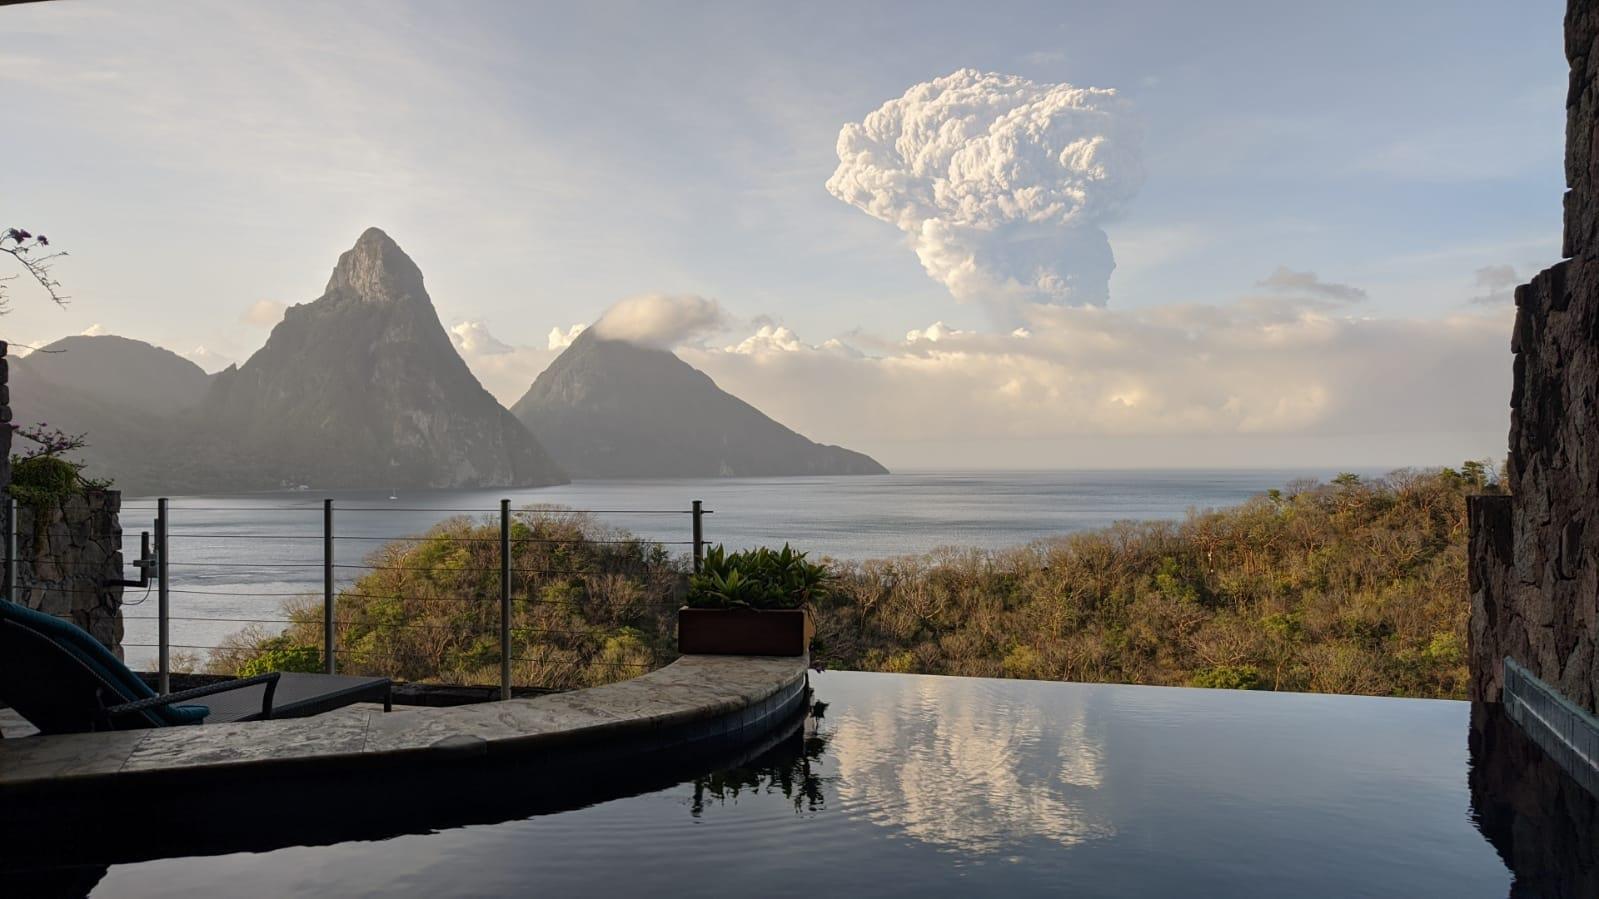 La Soufriere 630AM eruption seen from St Lucia